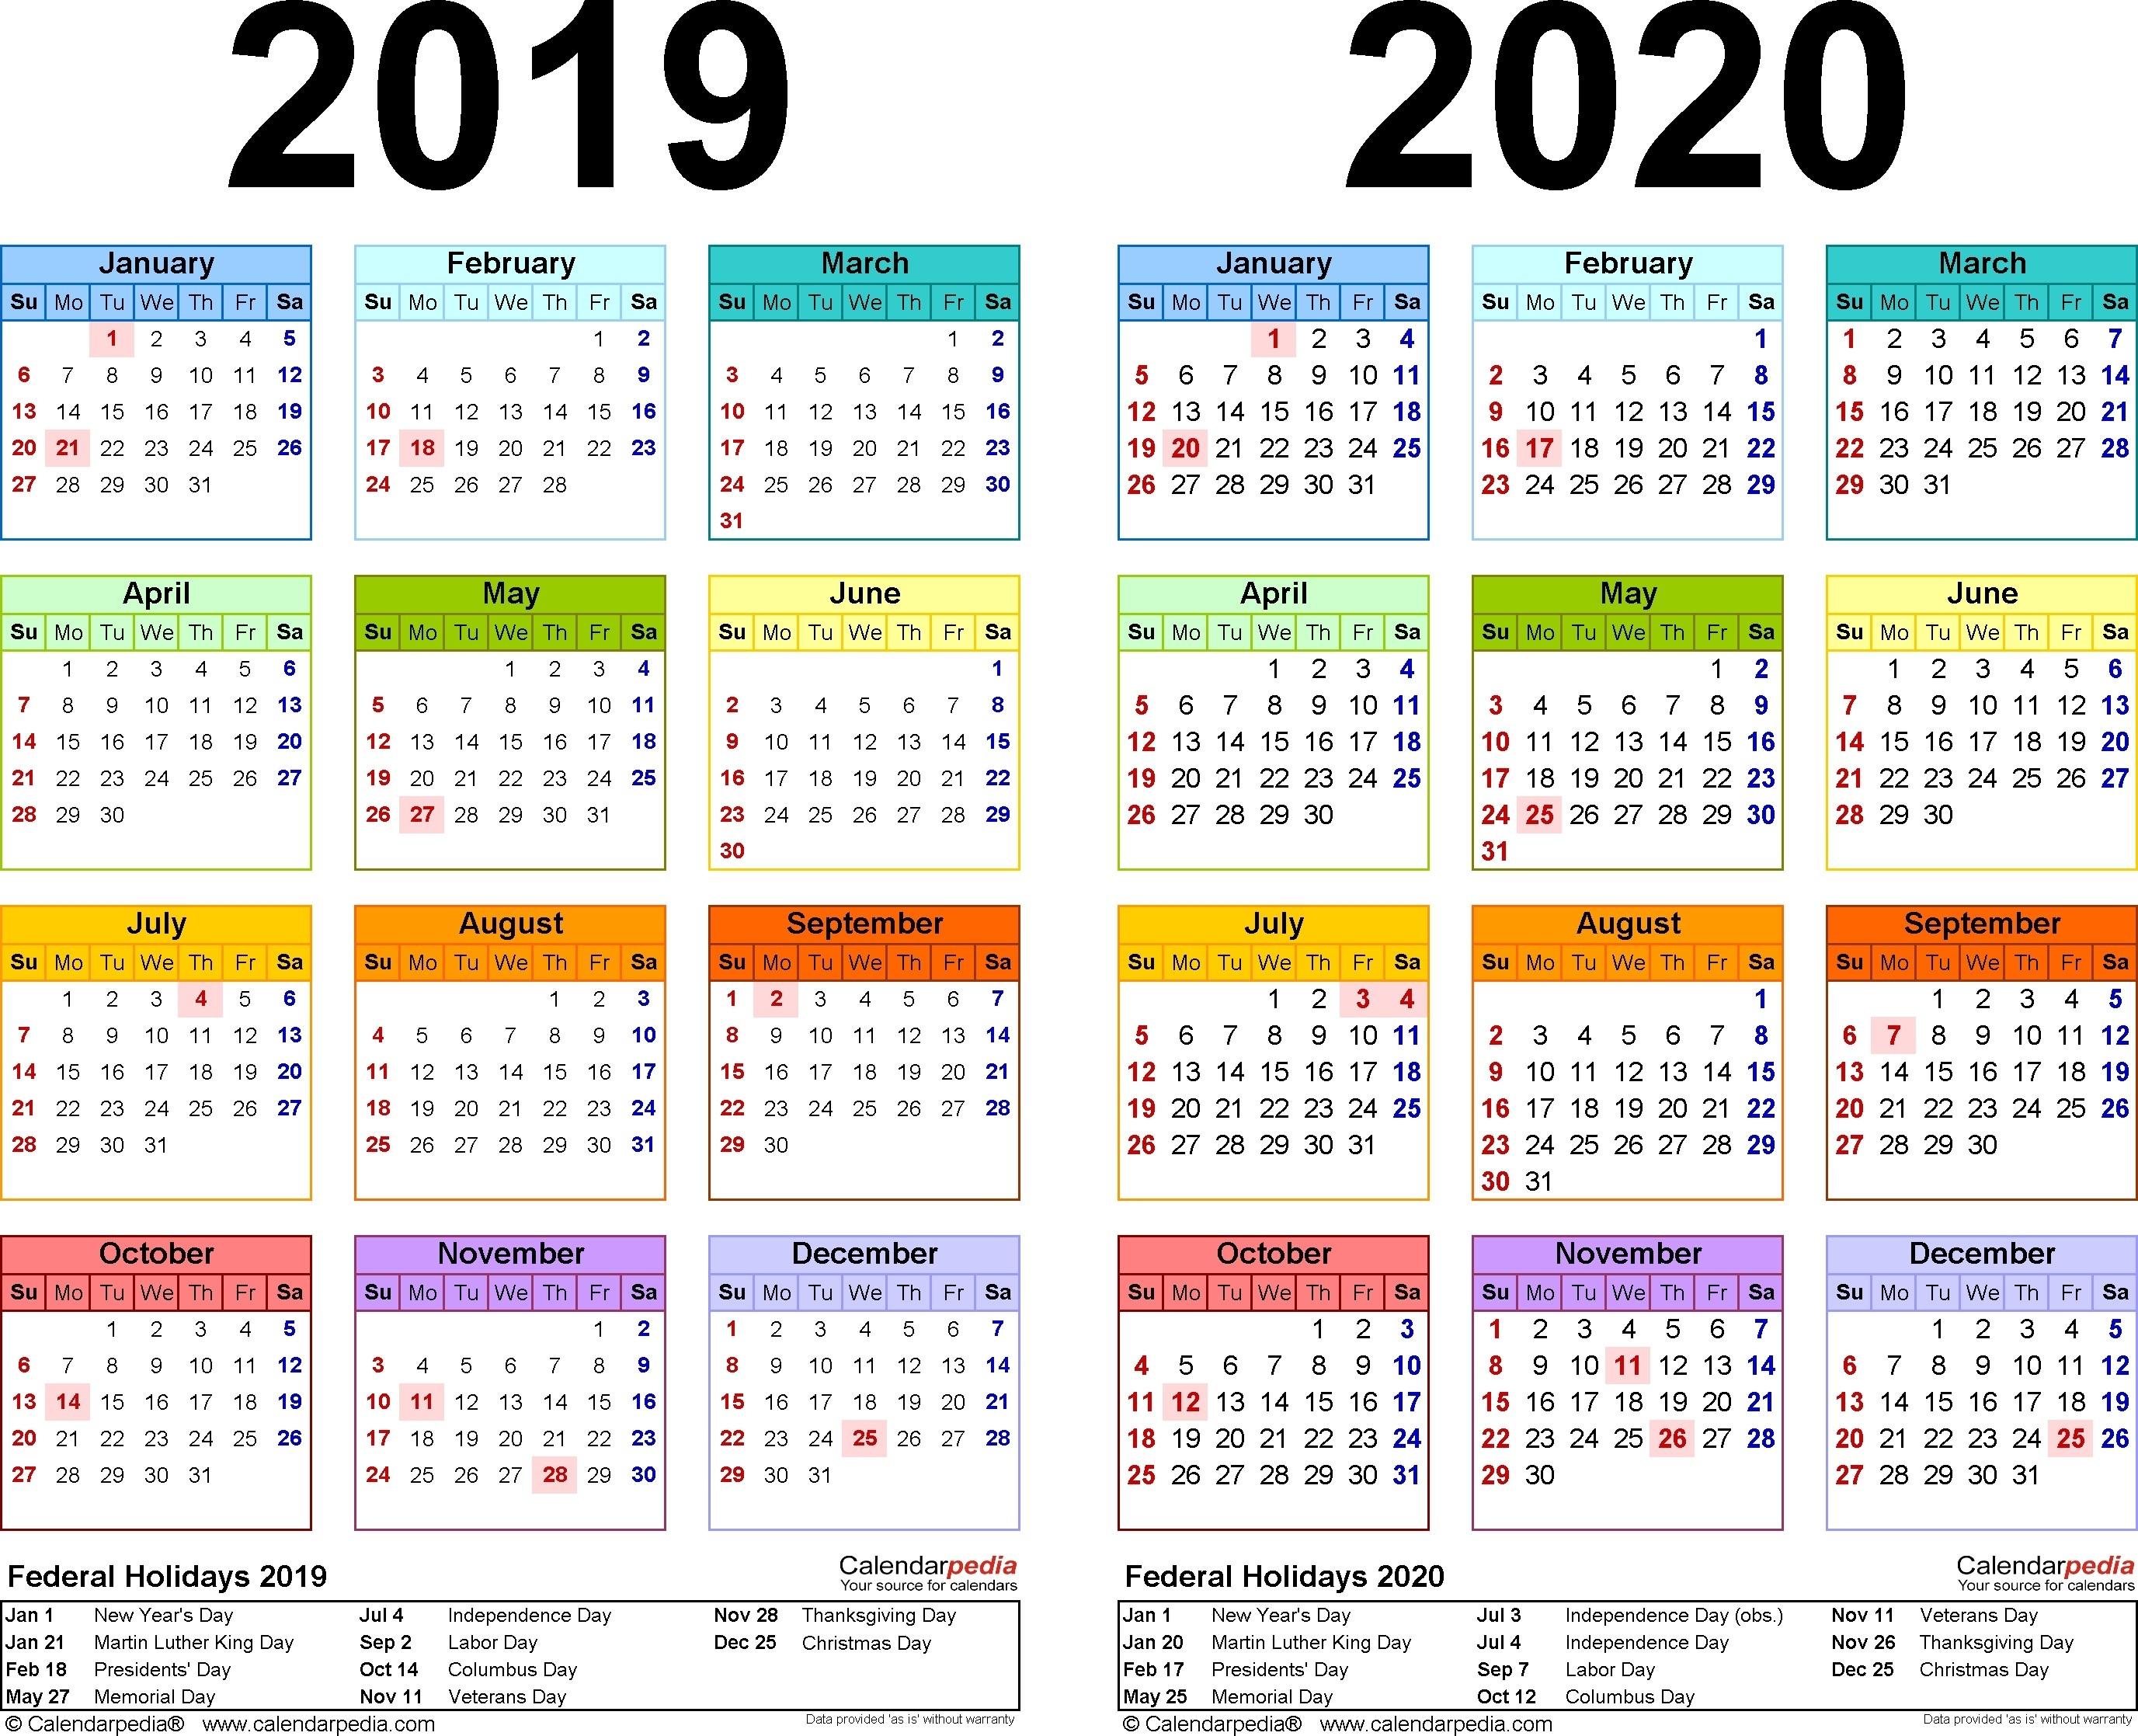 Perky 2020 Calendar School Holidays • Printable Blank-Printable Calendar 2020 School Holidays Qld